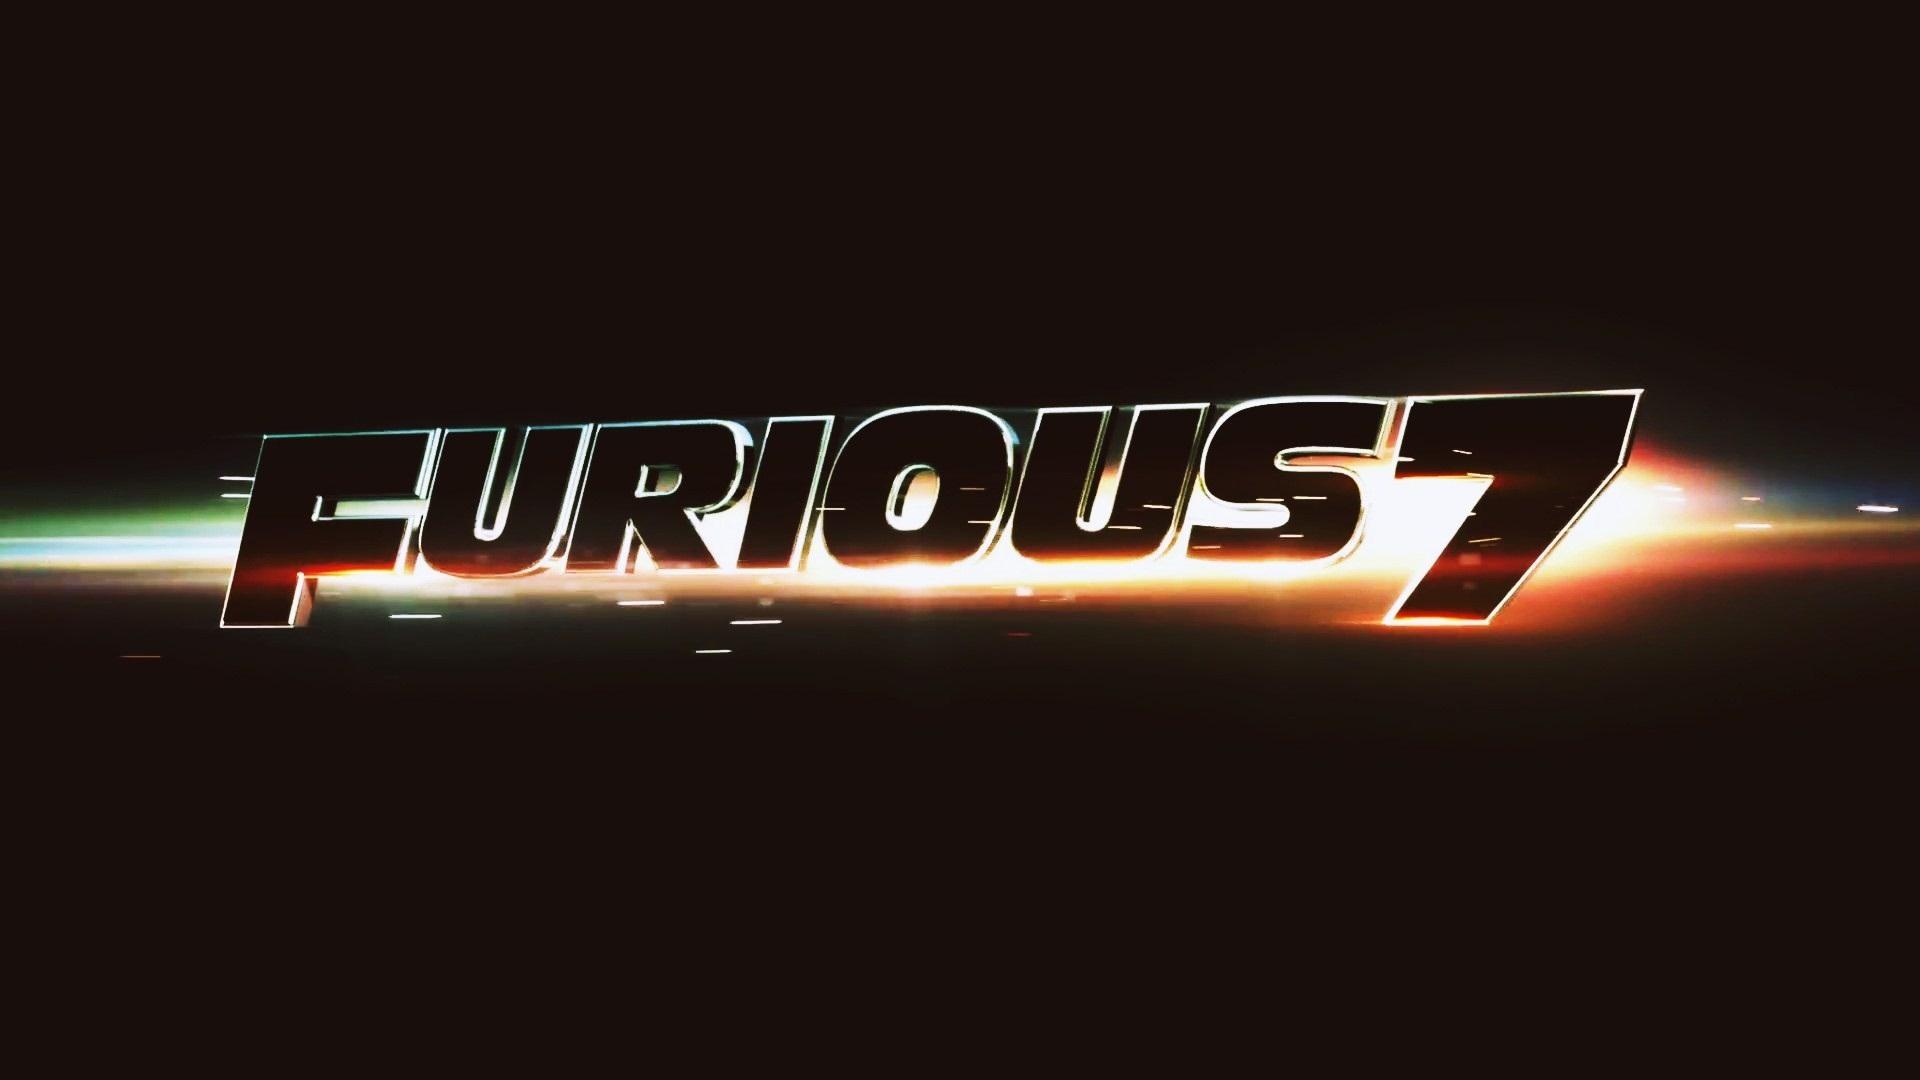 Furious 7 2015 Movie  HD Wallpapers Download Desktop 1920x1080